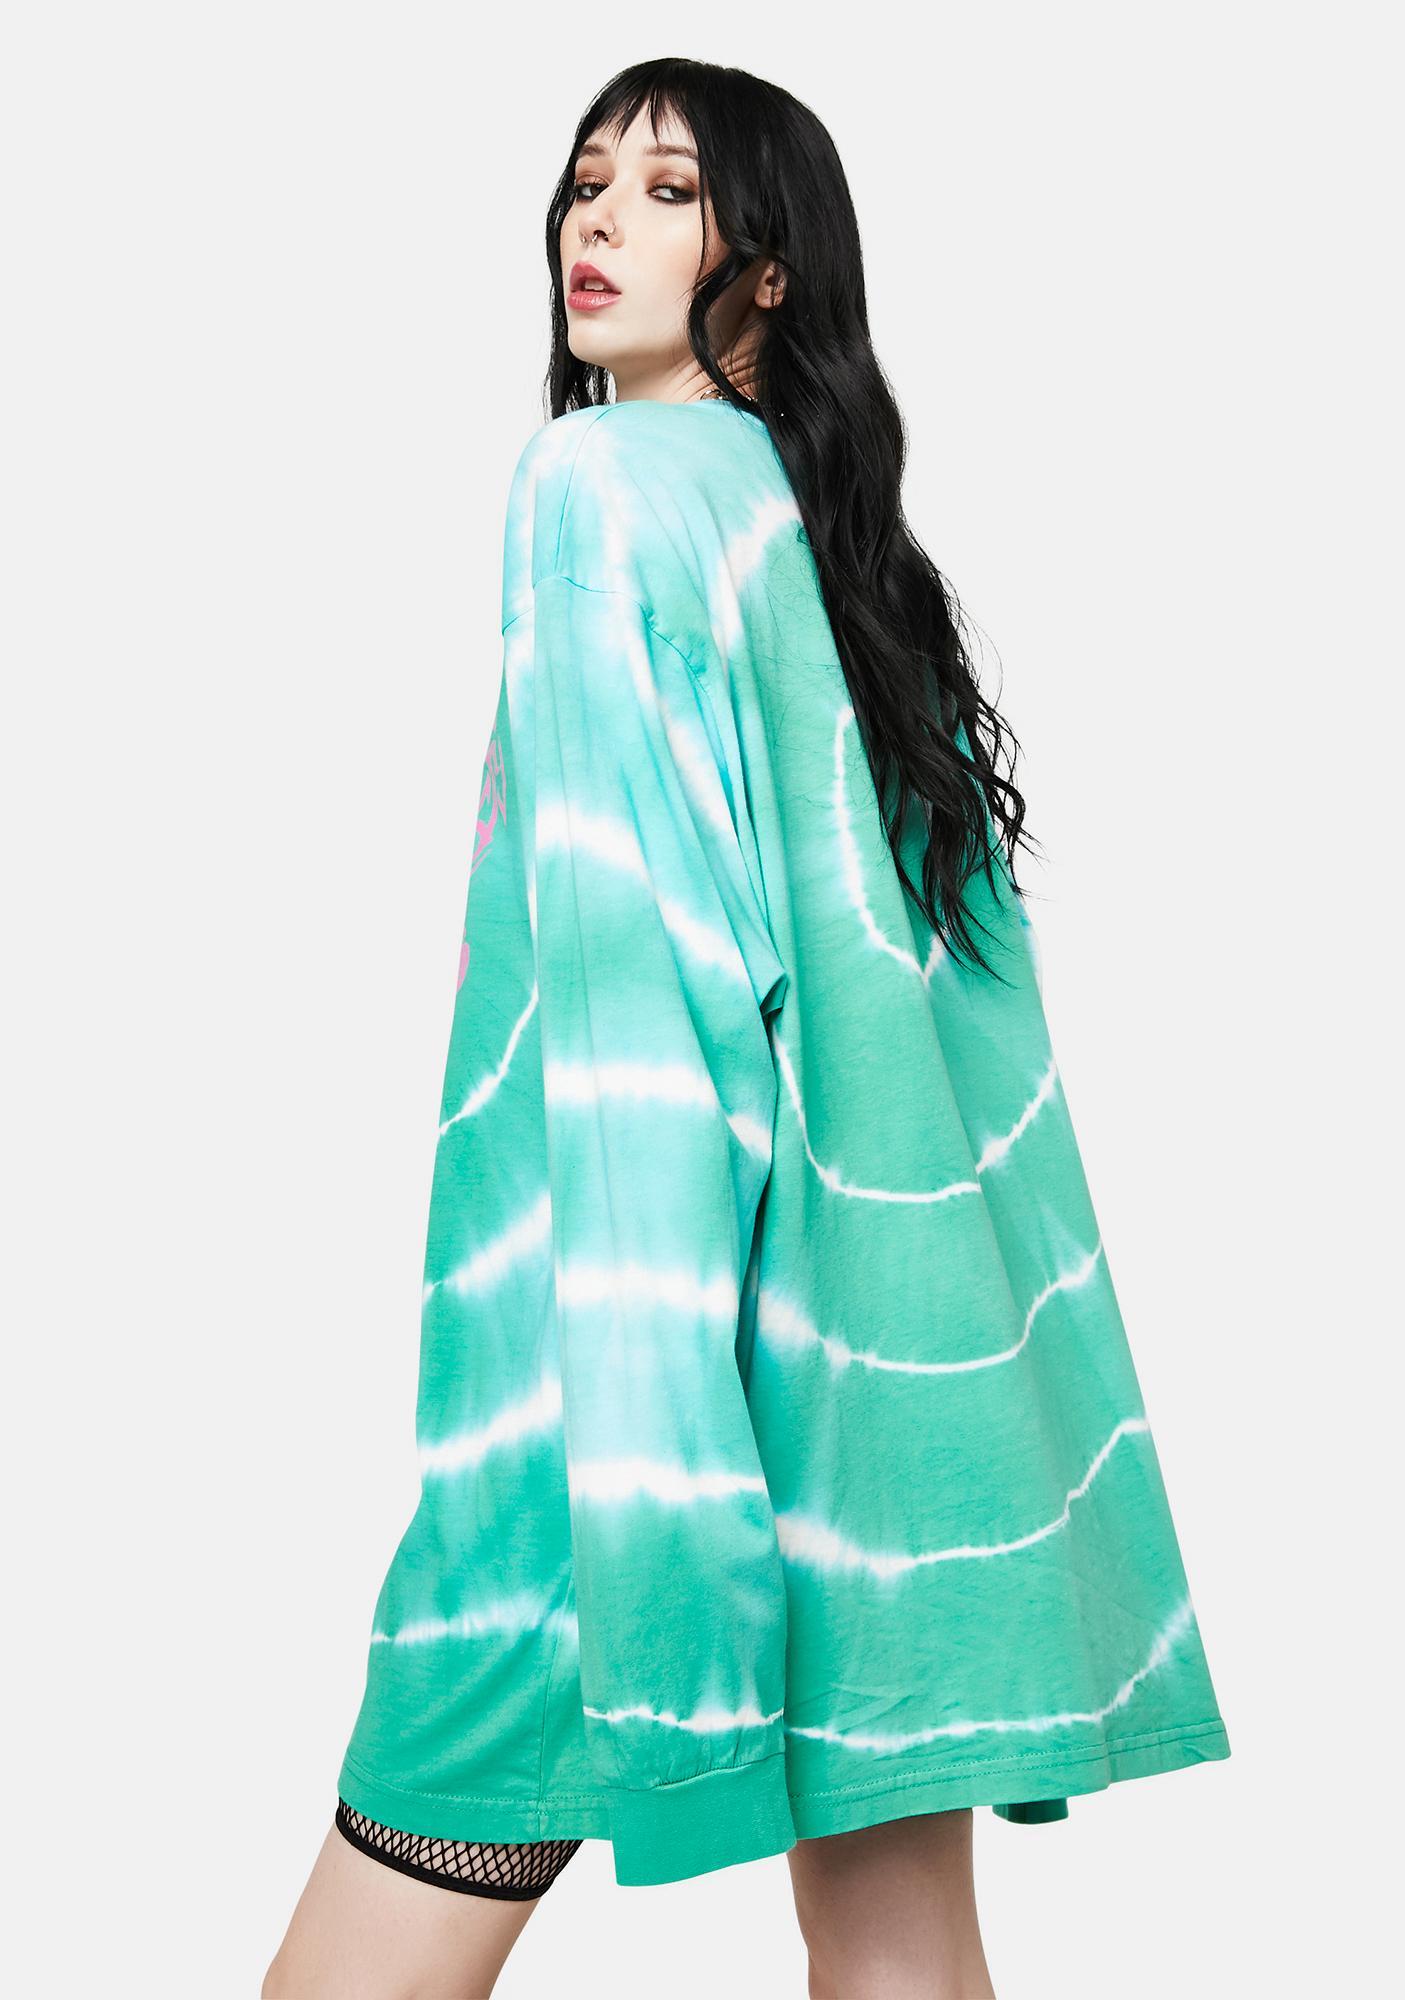 NEW GIRL ORDER Dragon Print Tie Dye Long Sleeve Tee